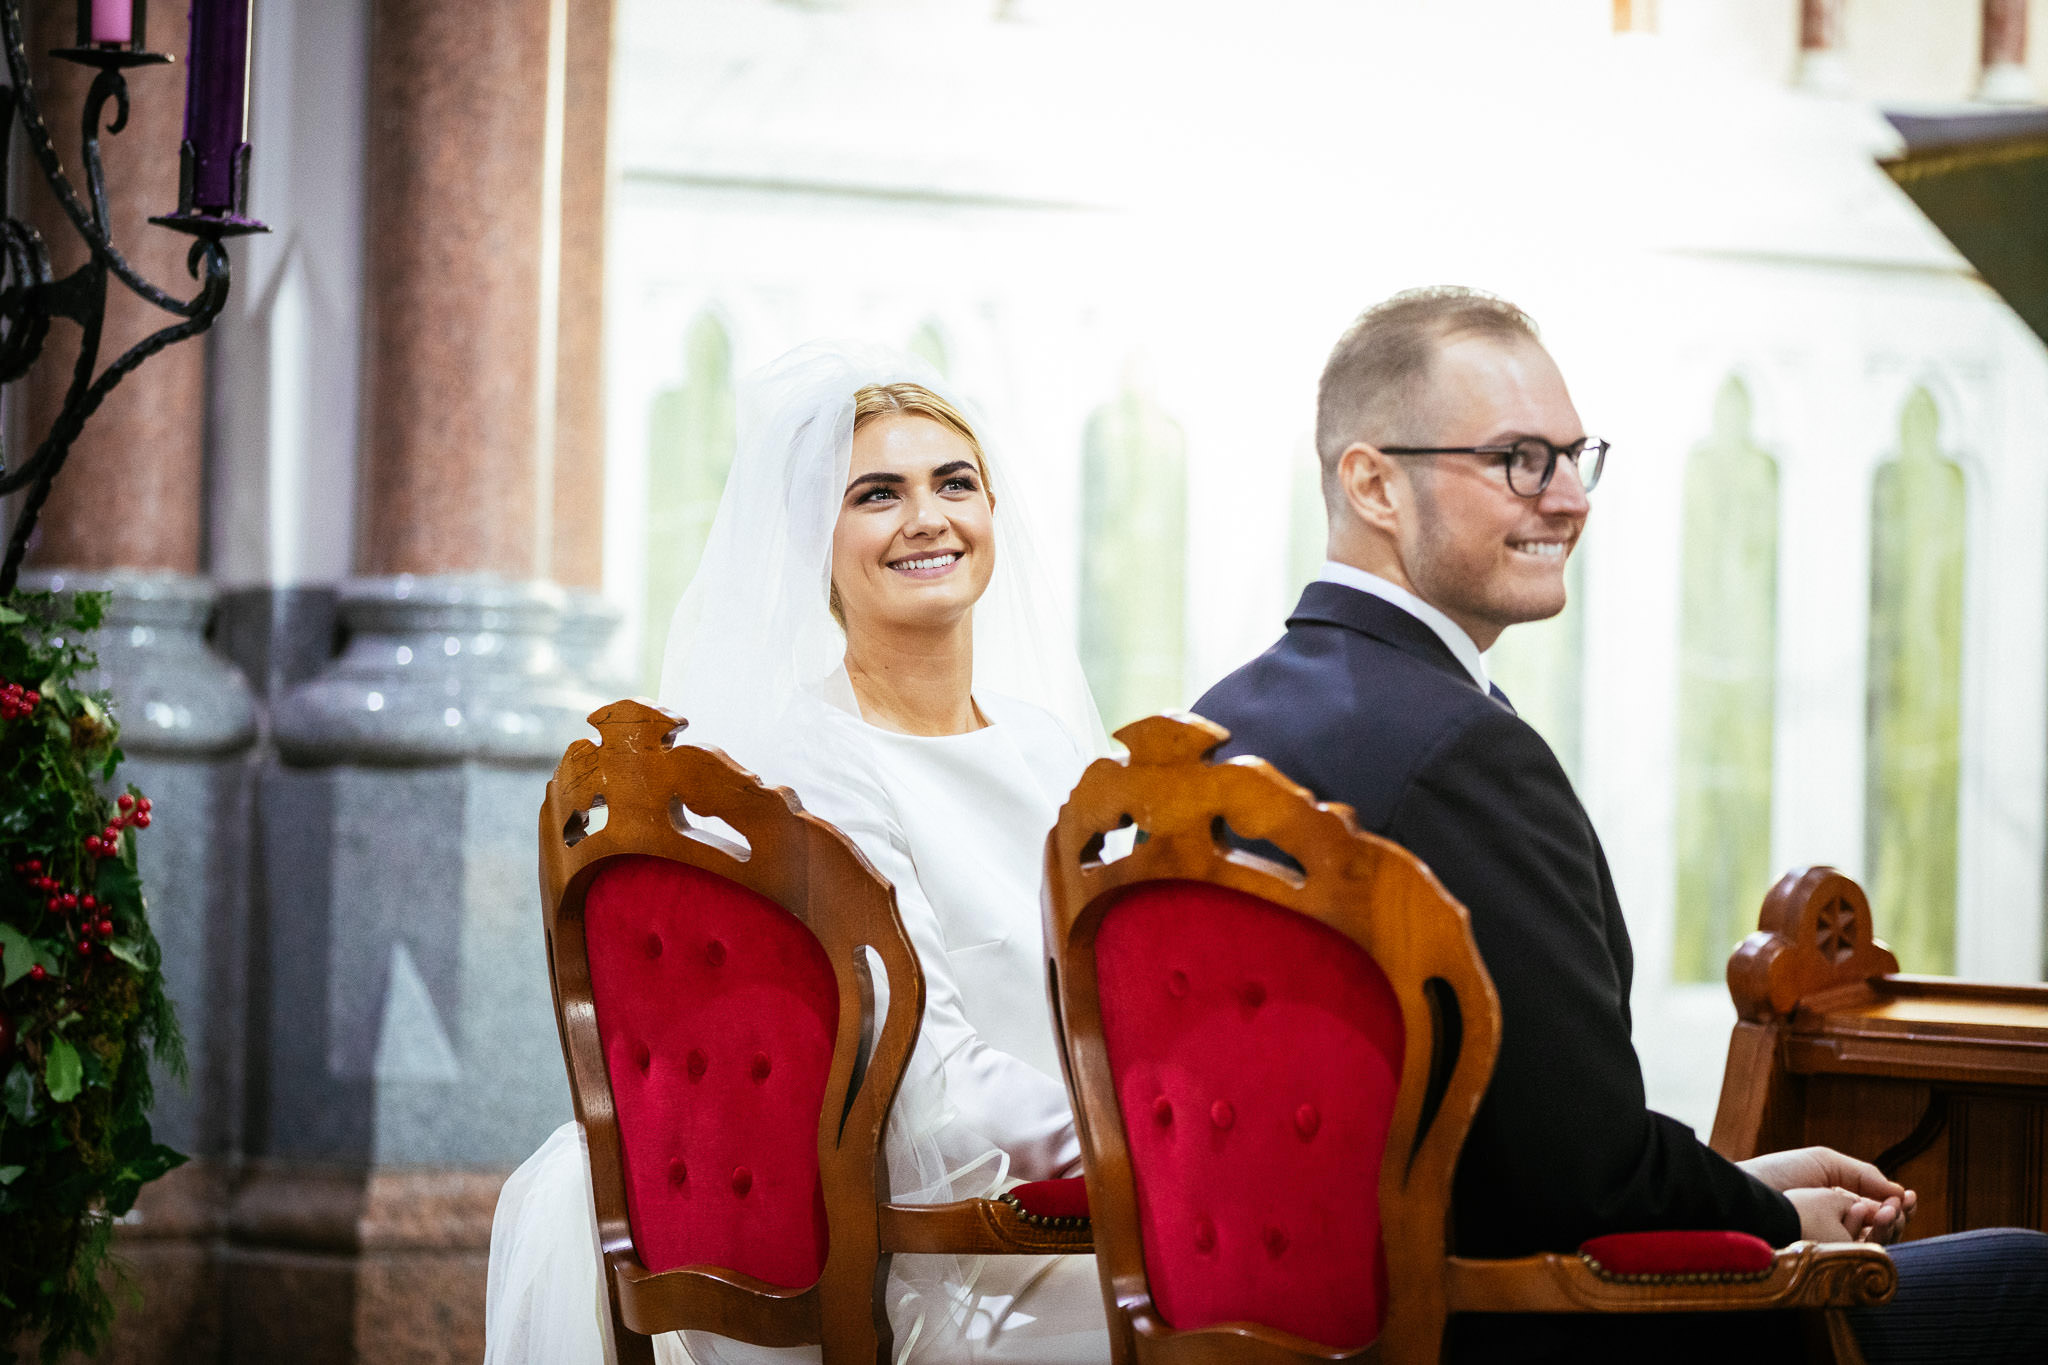 Virginia park lodge Wedding Photographer 77